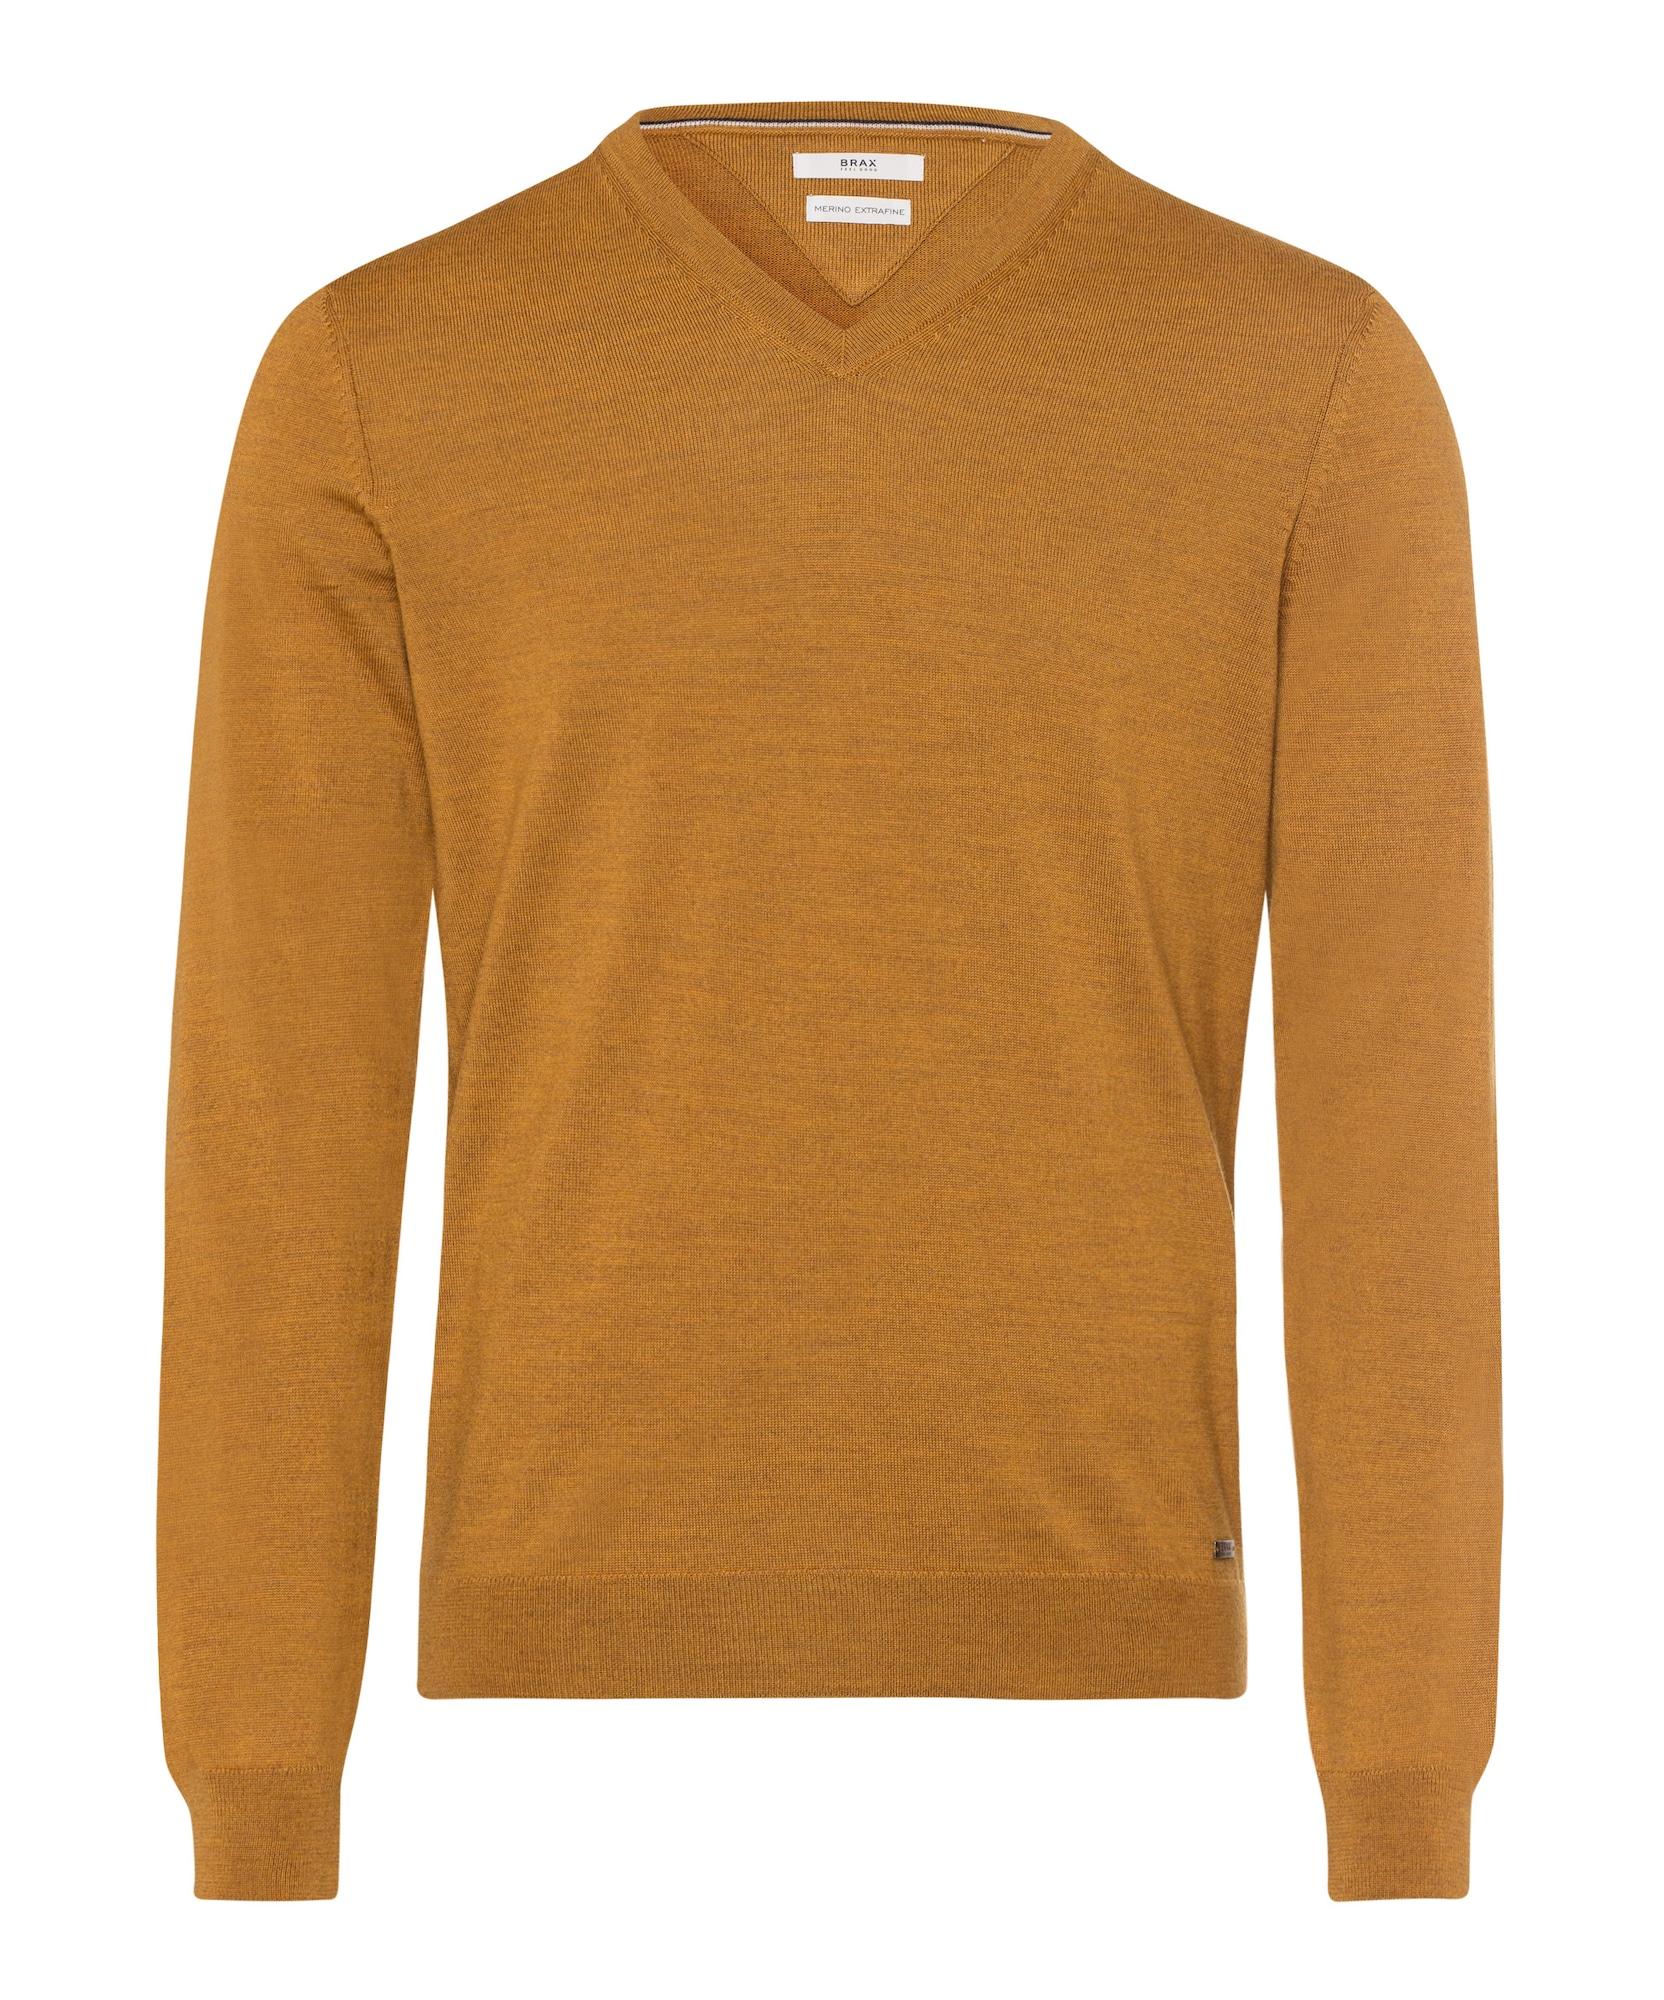 Pullover 'Vico' | Bekleidung > Pullover > Sonstige Pullover | Beige | BRAX